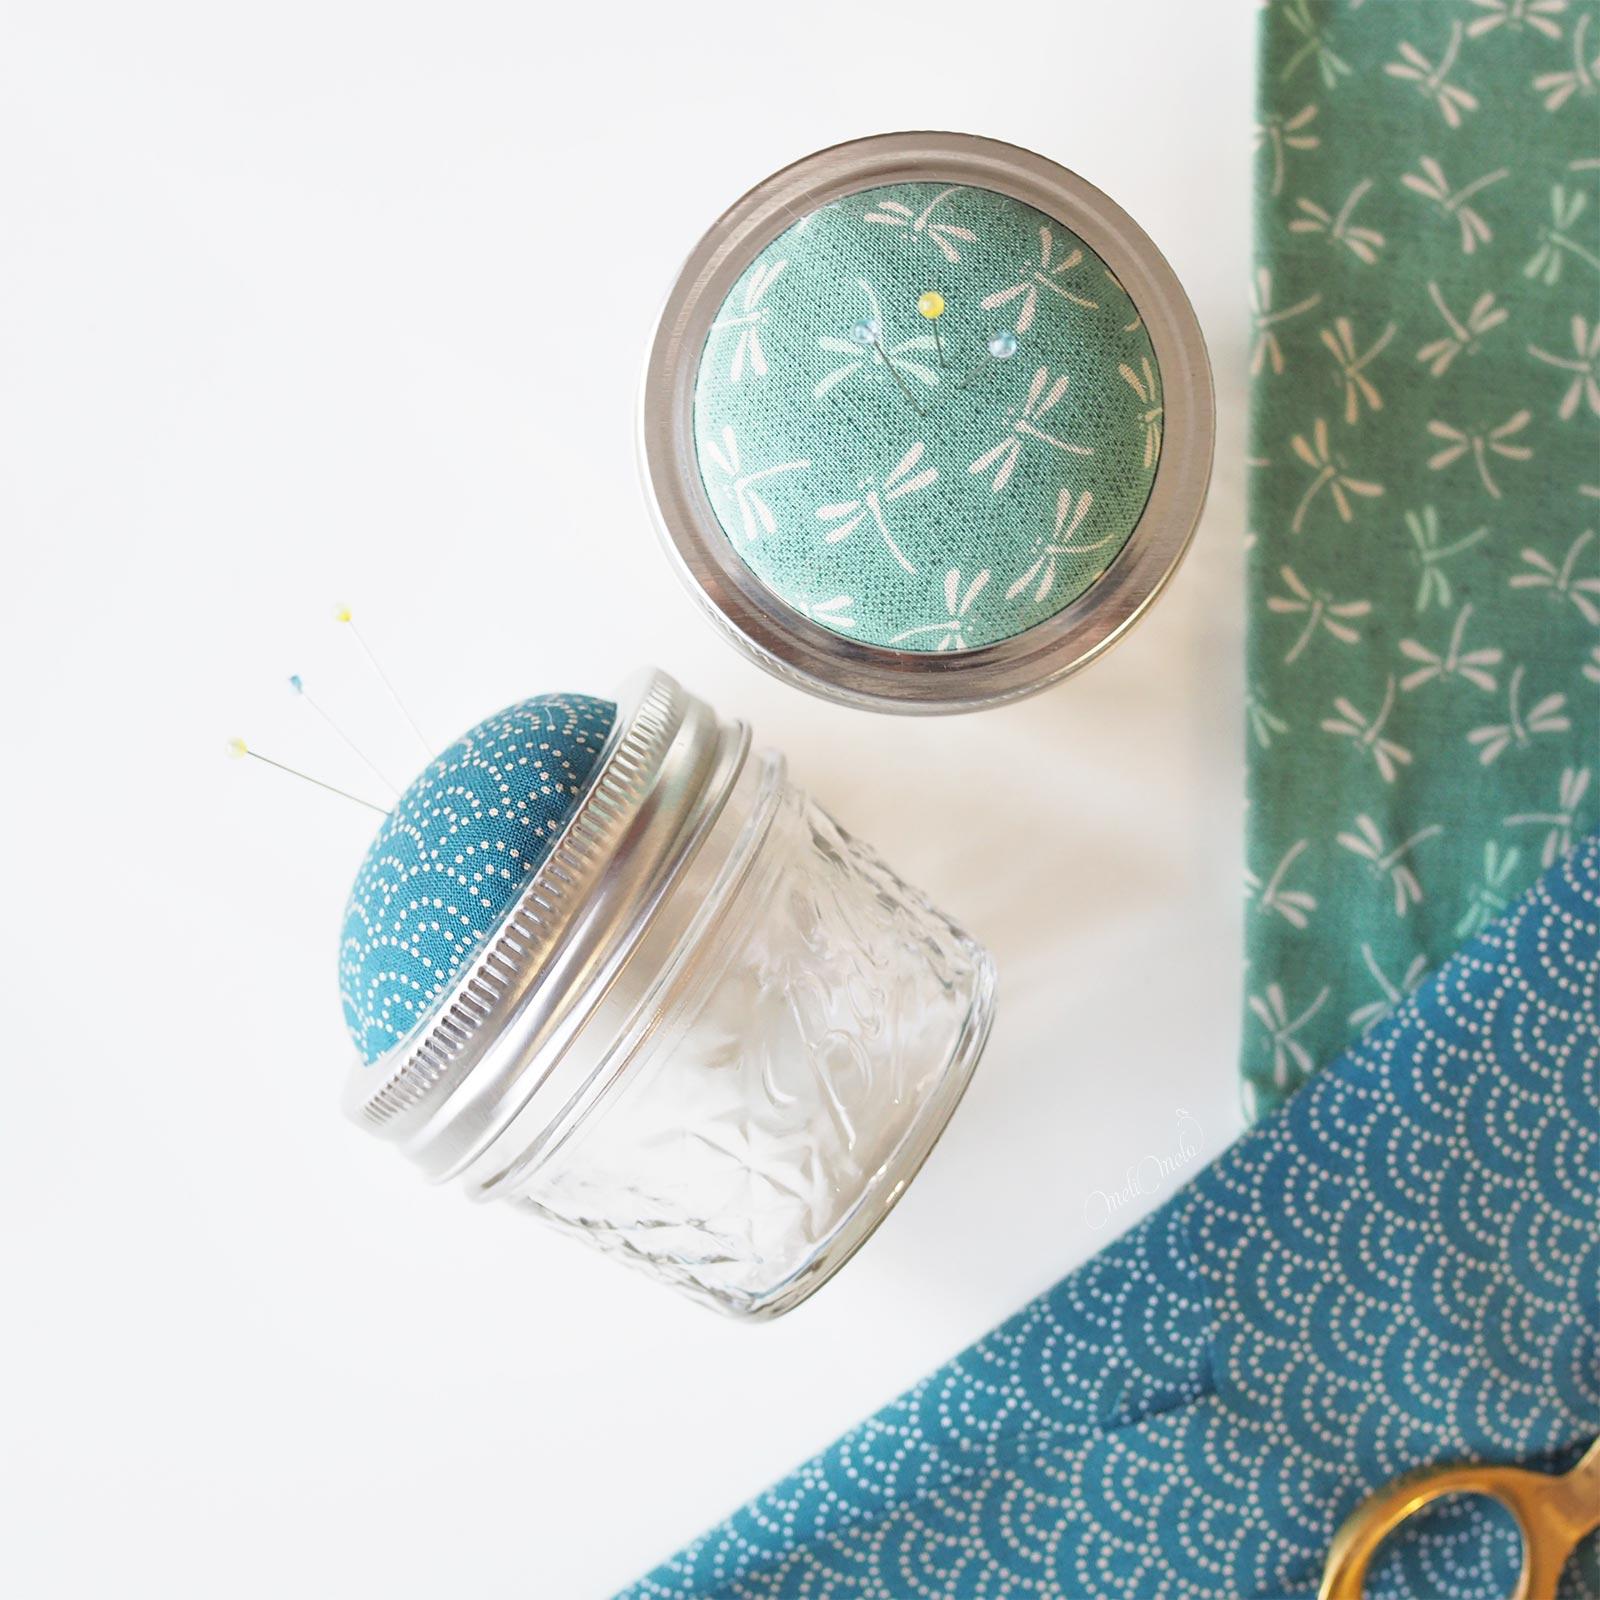 pique-aiguilles tissu japonais verveine indigo ball mason jar Boutique MeliMelo